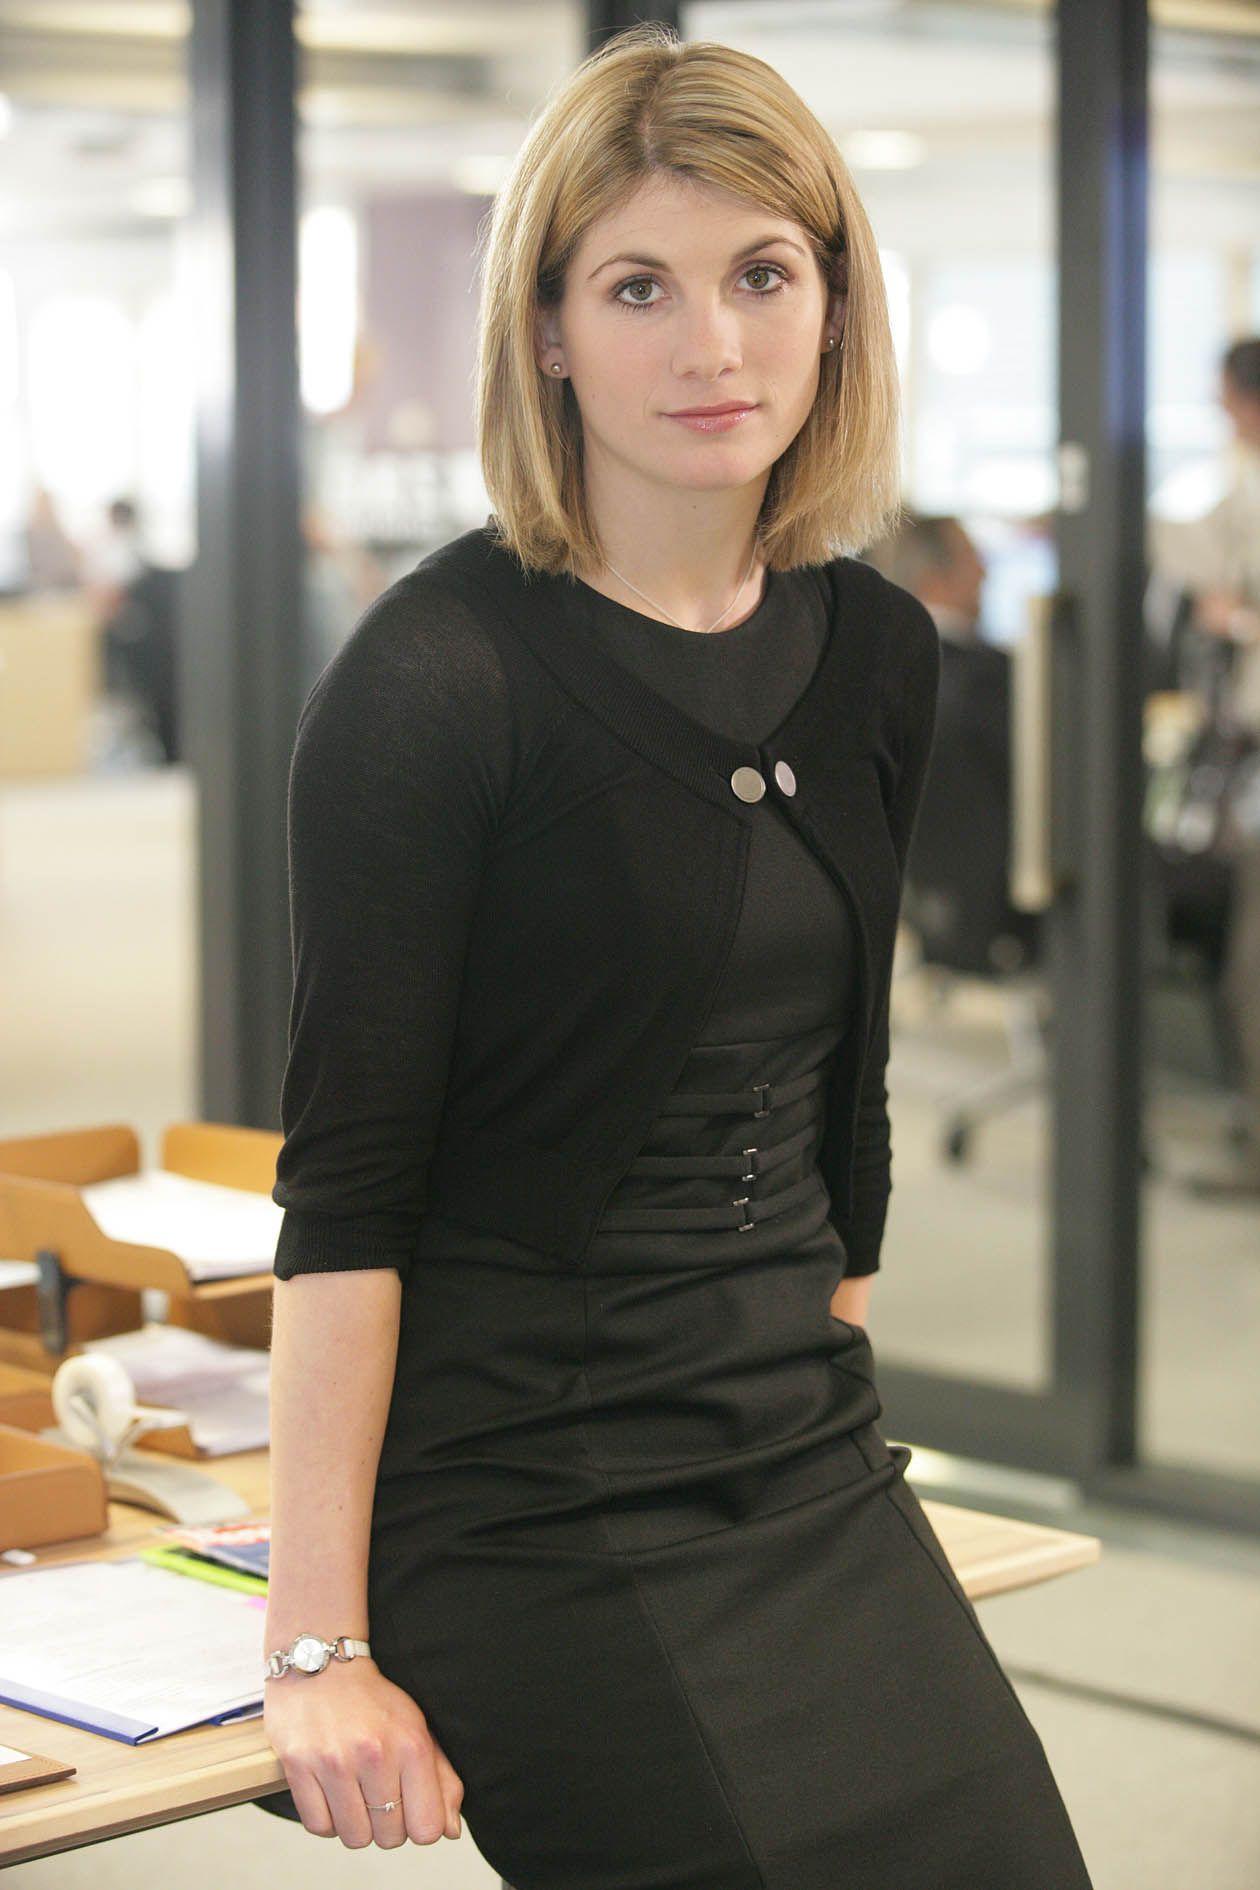 picture Linda Cook (actress)